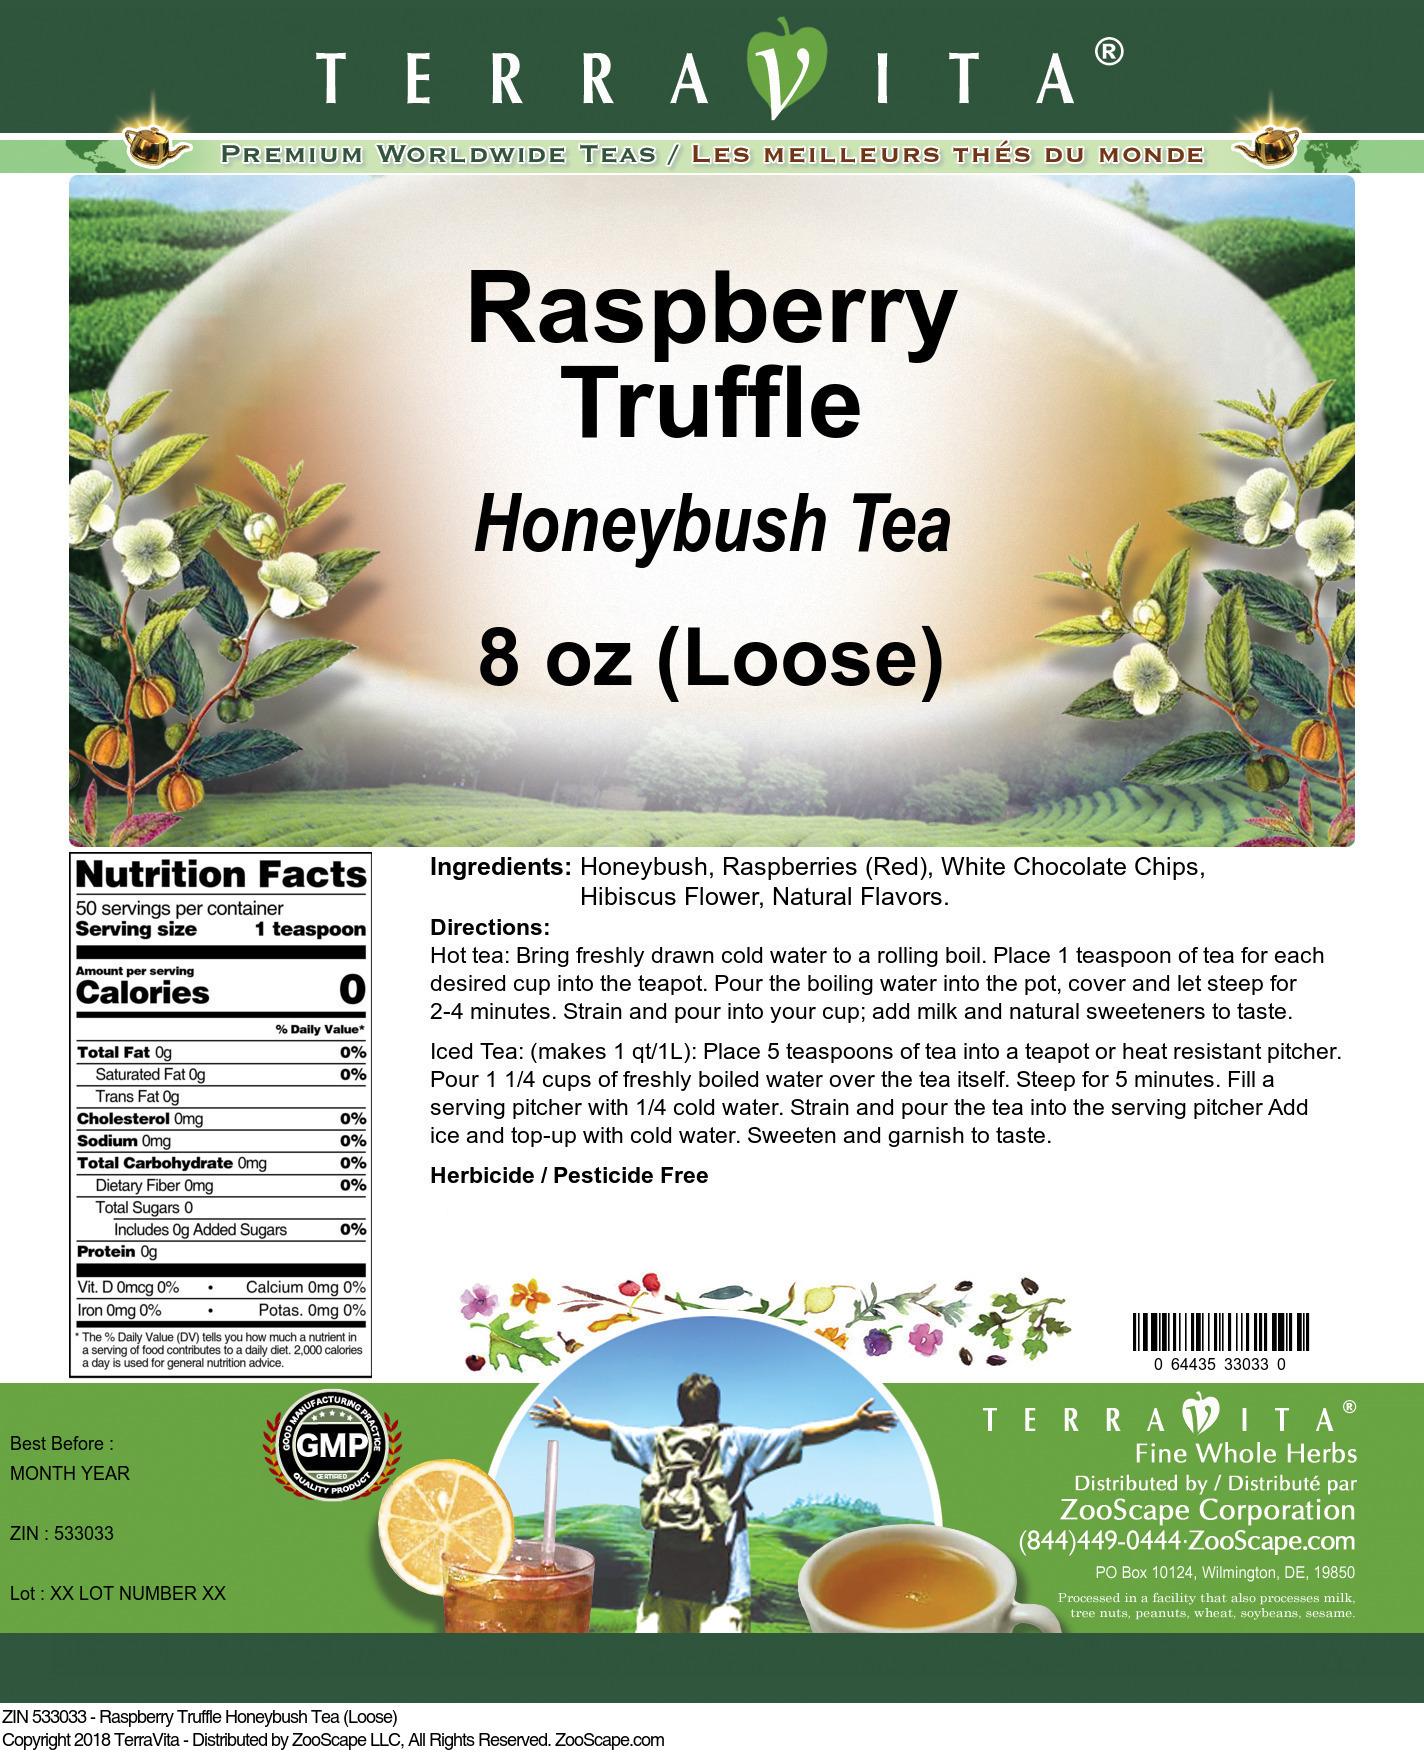 Raspberry Truffle Honeybush Tea (Loose)